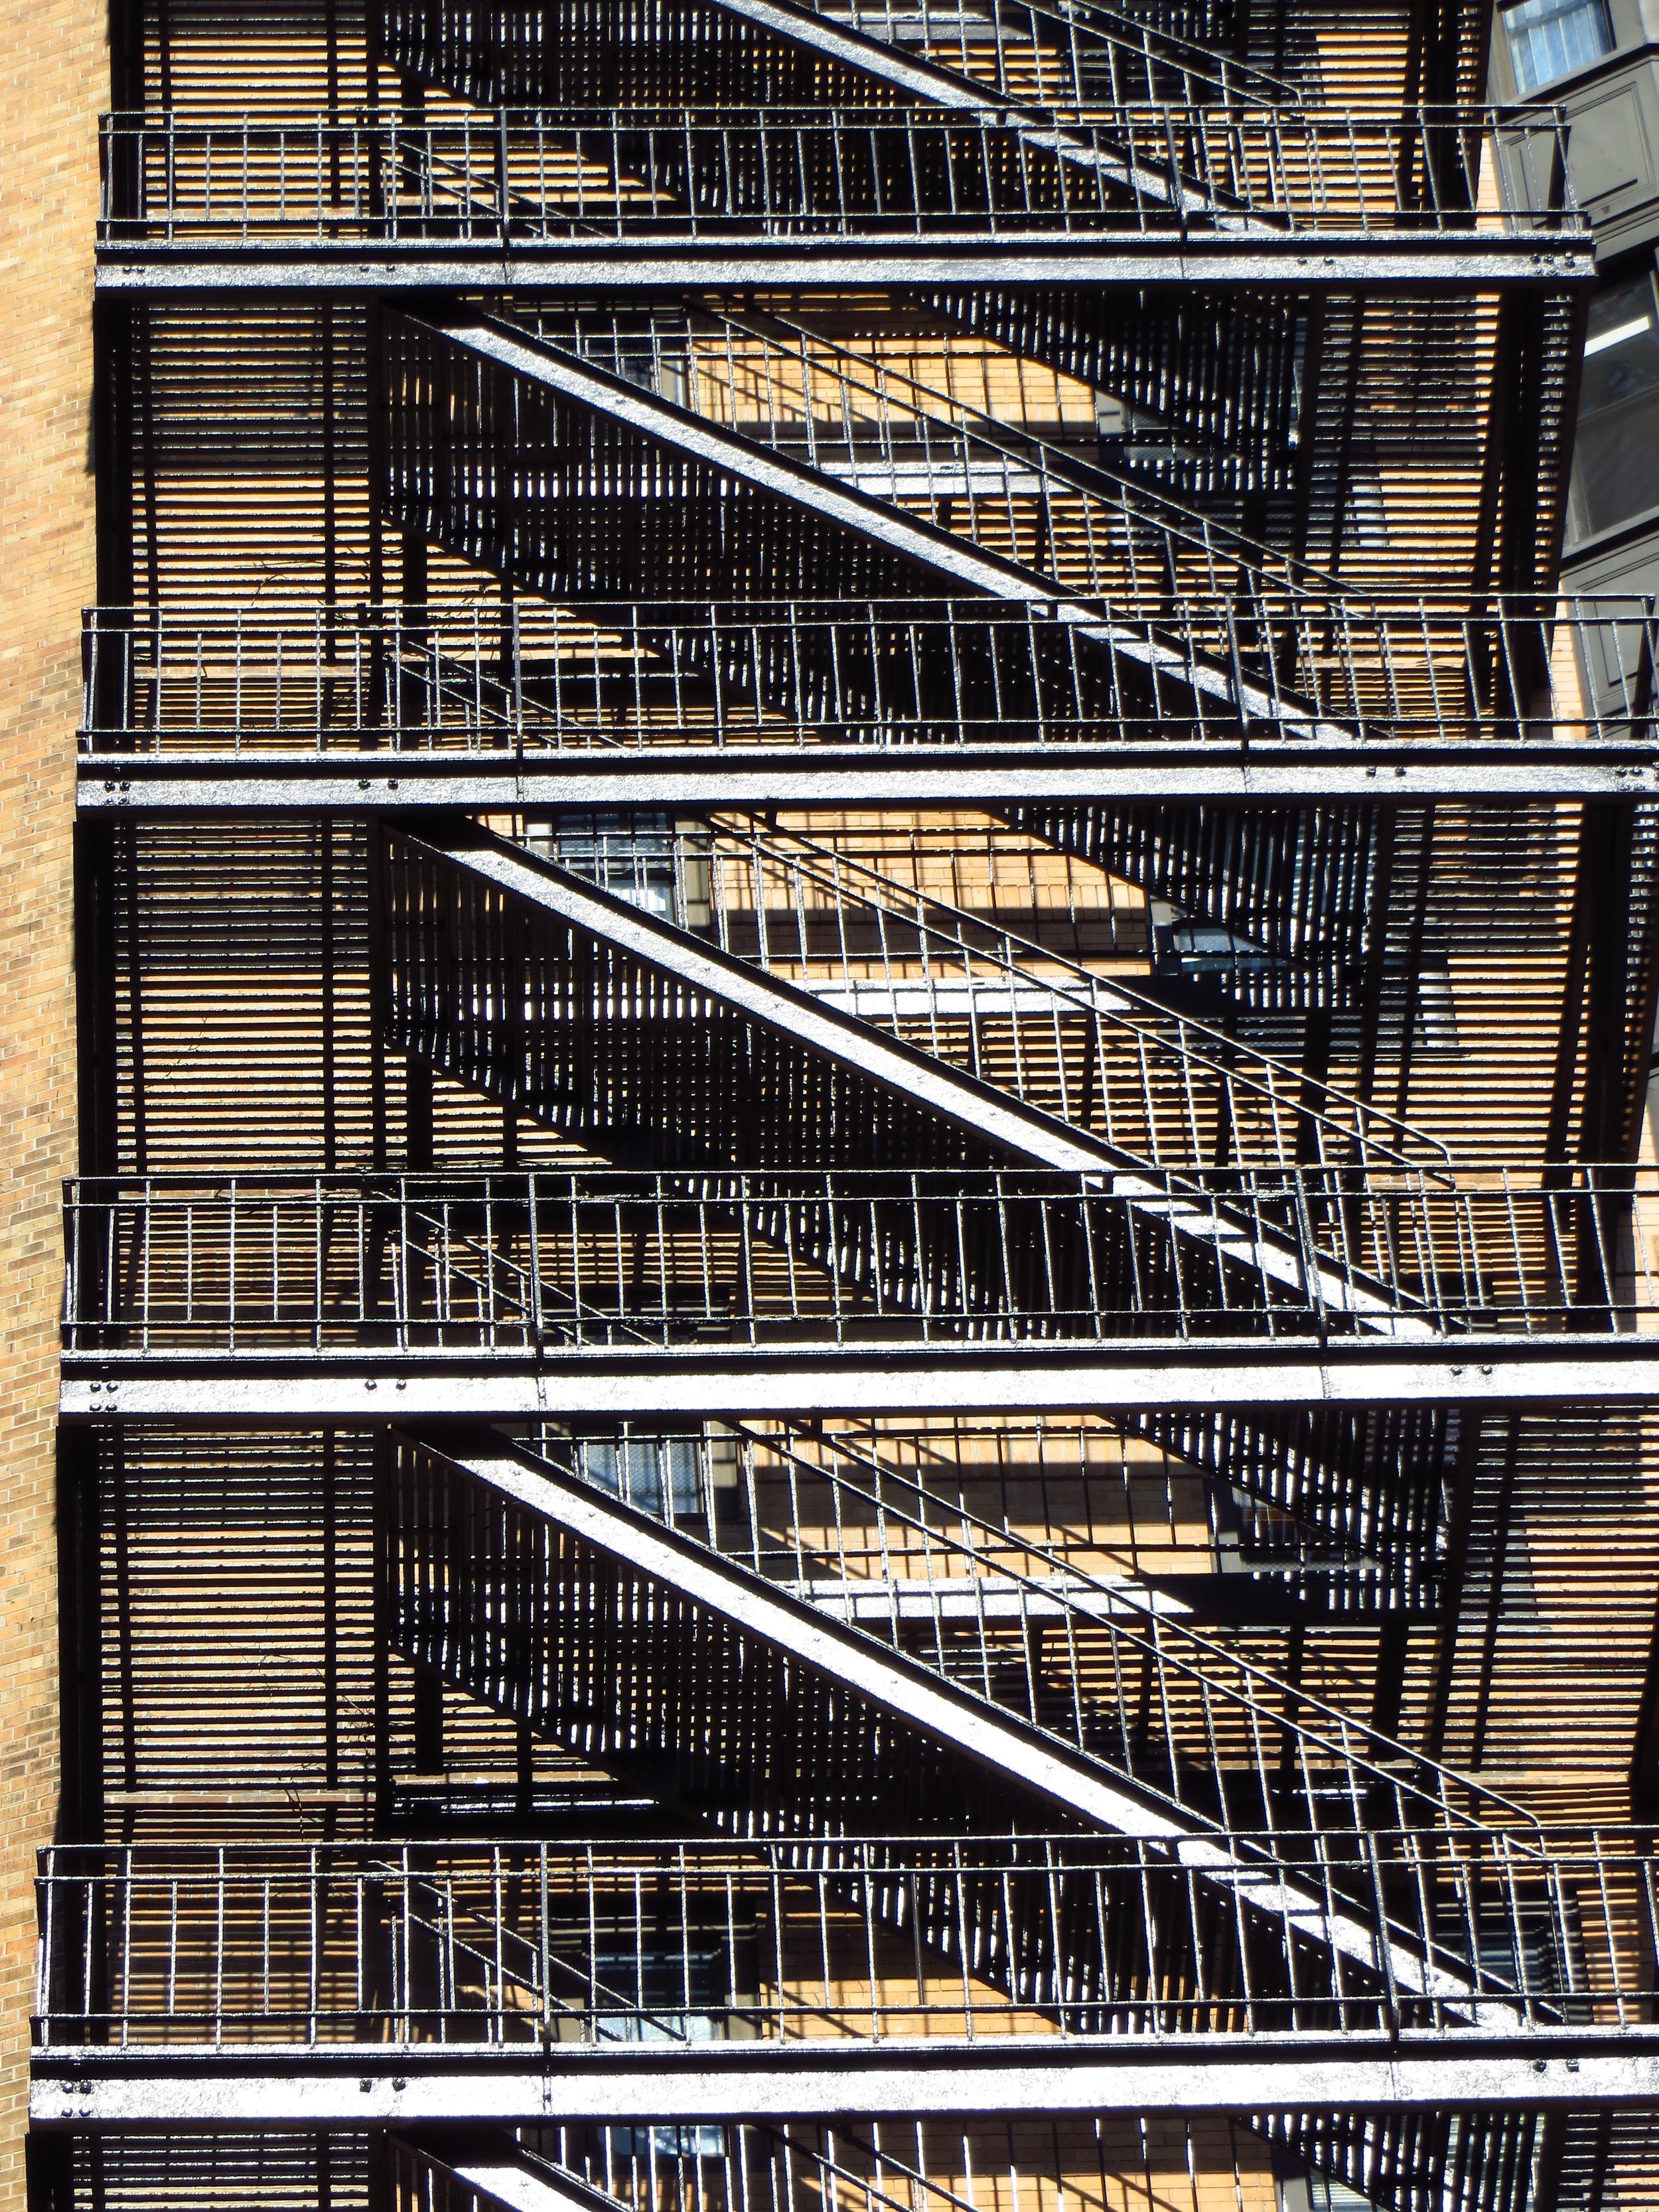 Close-up of fire escape